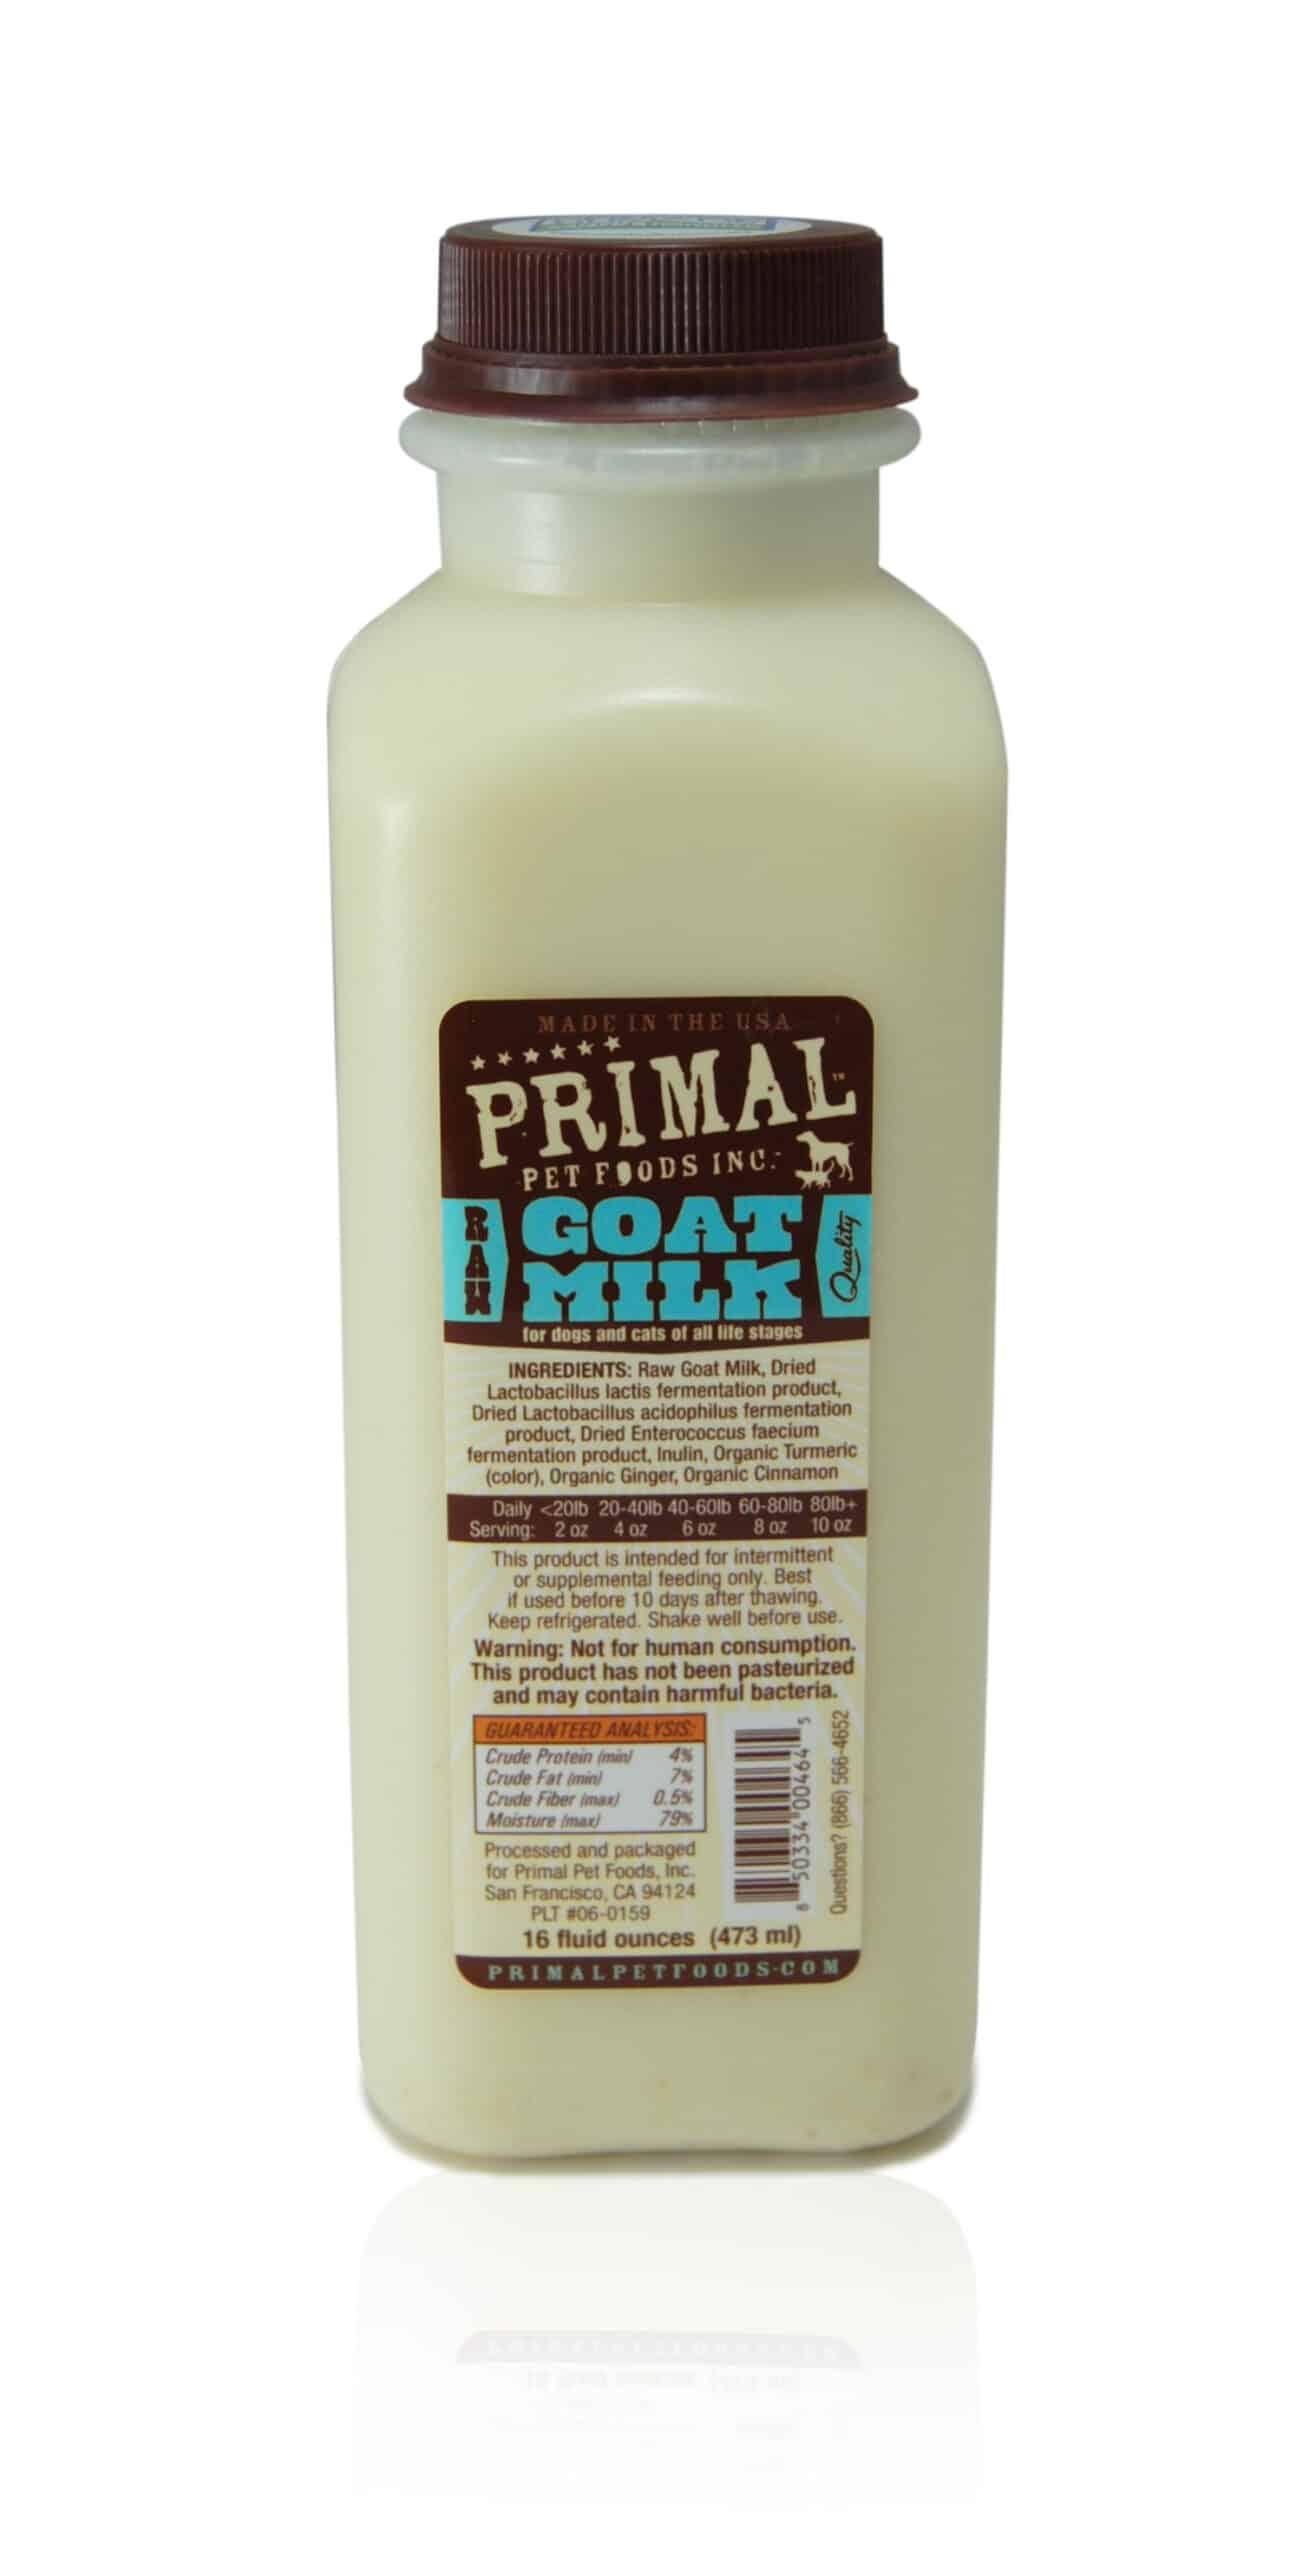 Primal 16oz Raw Goat Milk (1 pint)